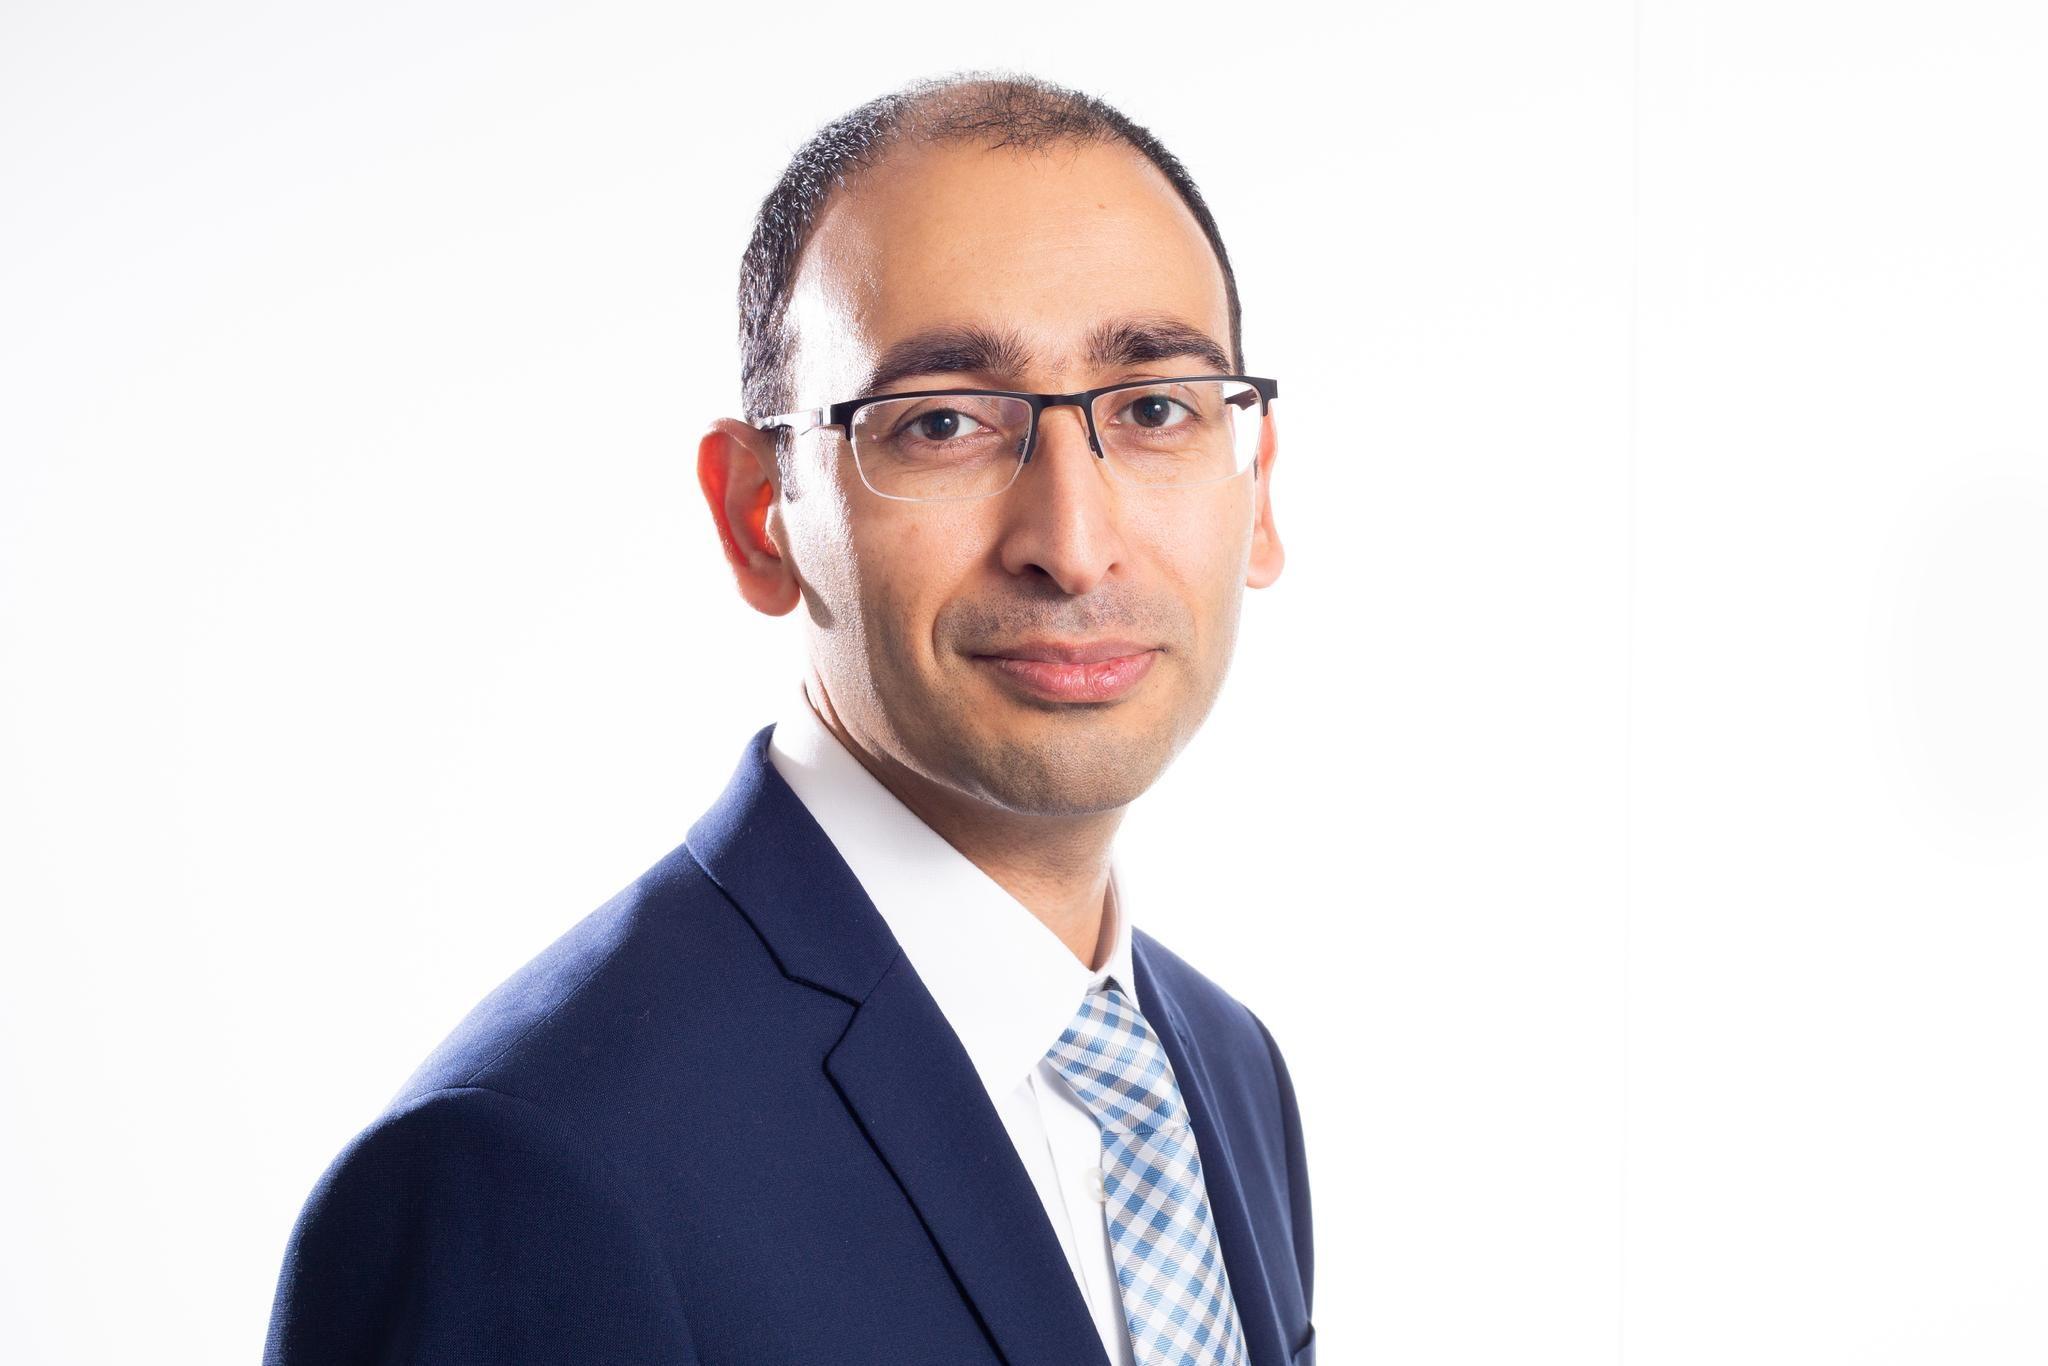 Nohman Awan